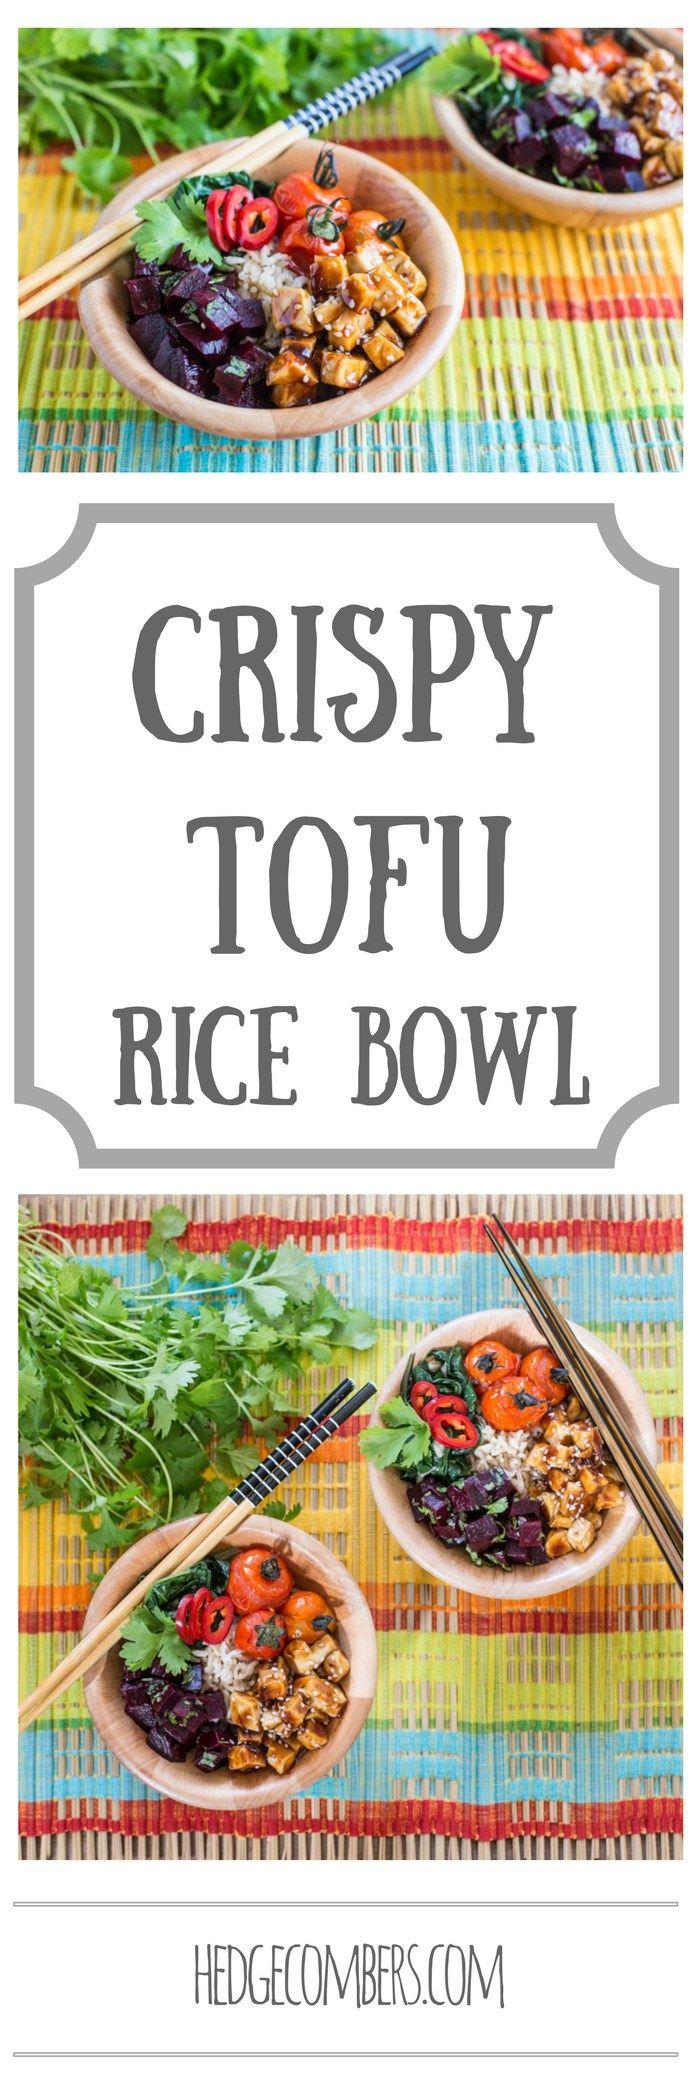 Crispy Tofu Rice Bowl